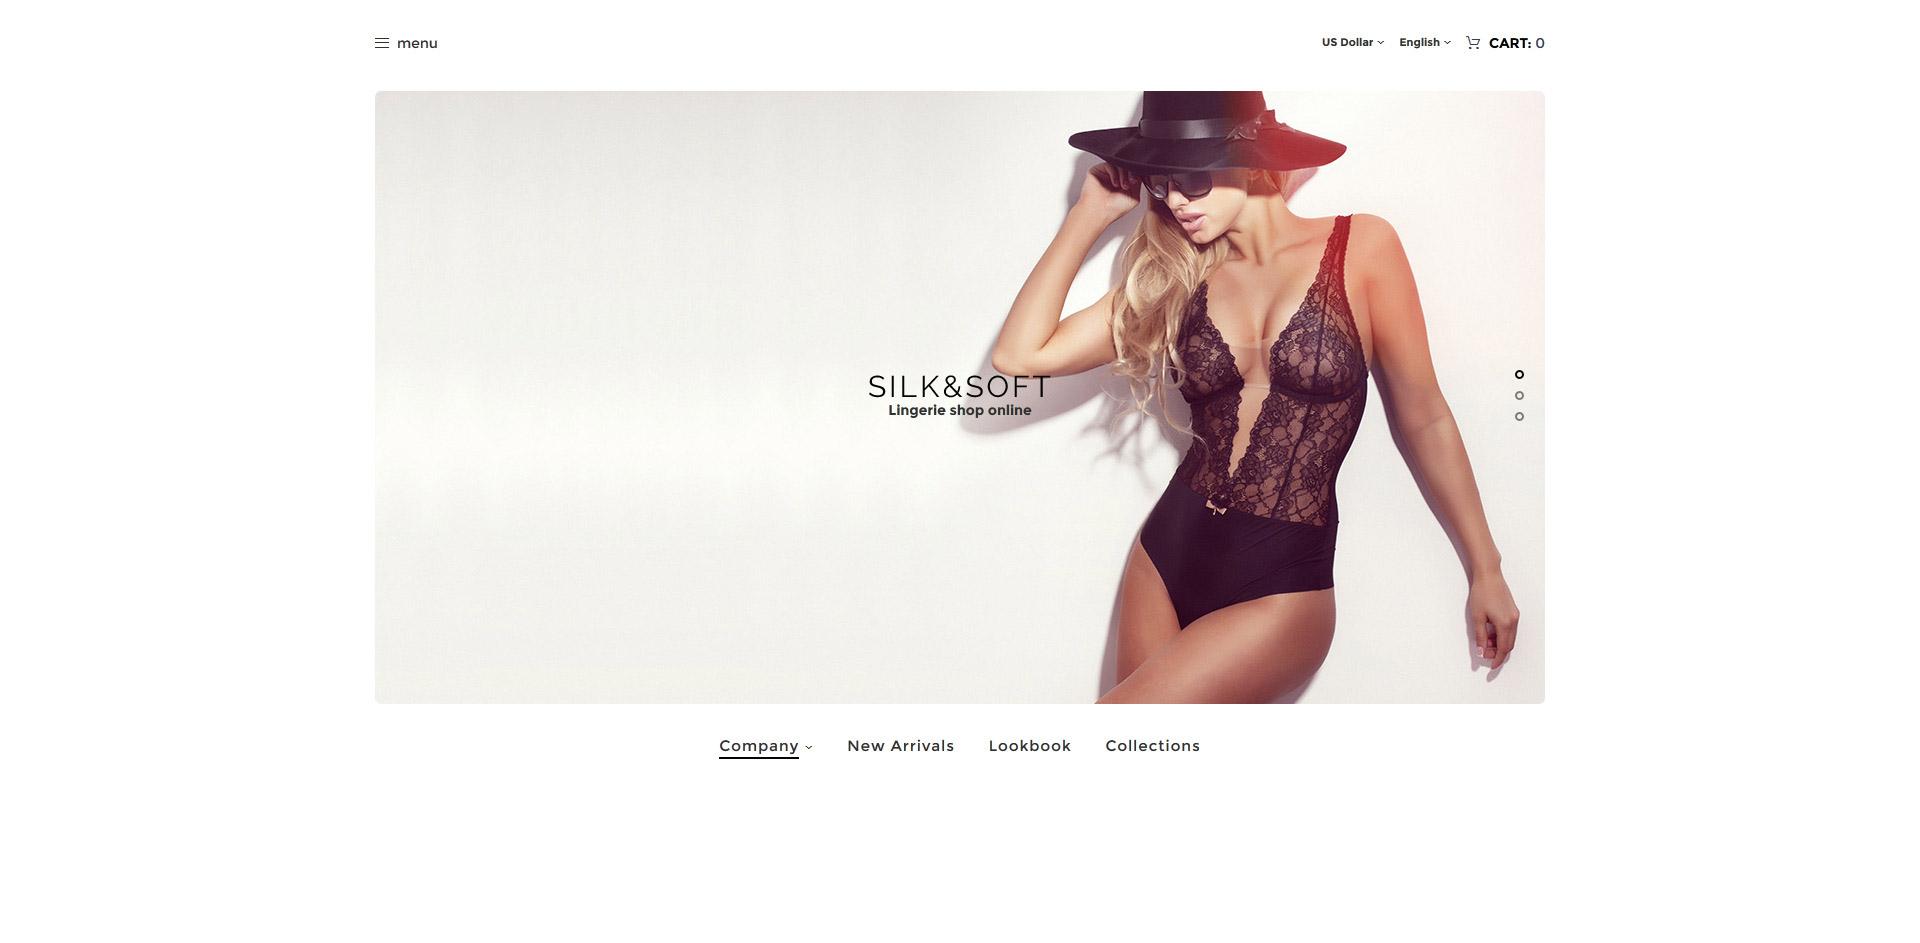 Silk & Soft - Underwear & Lingerie Online Store OpenCart Template